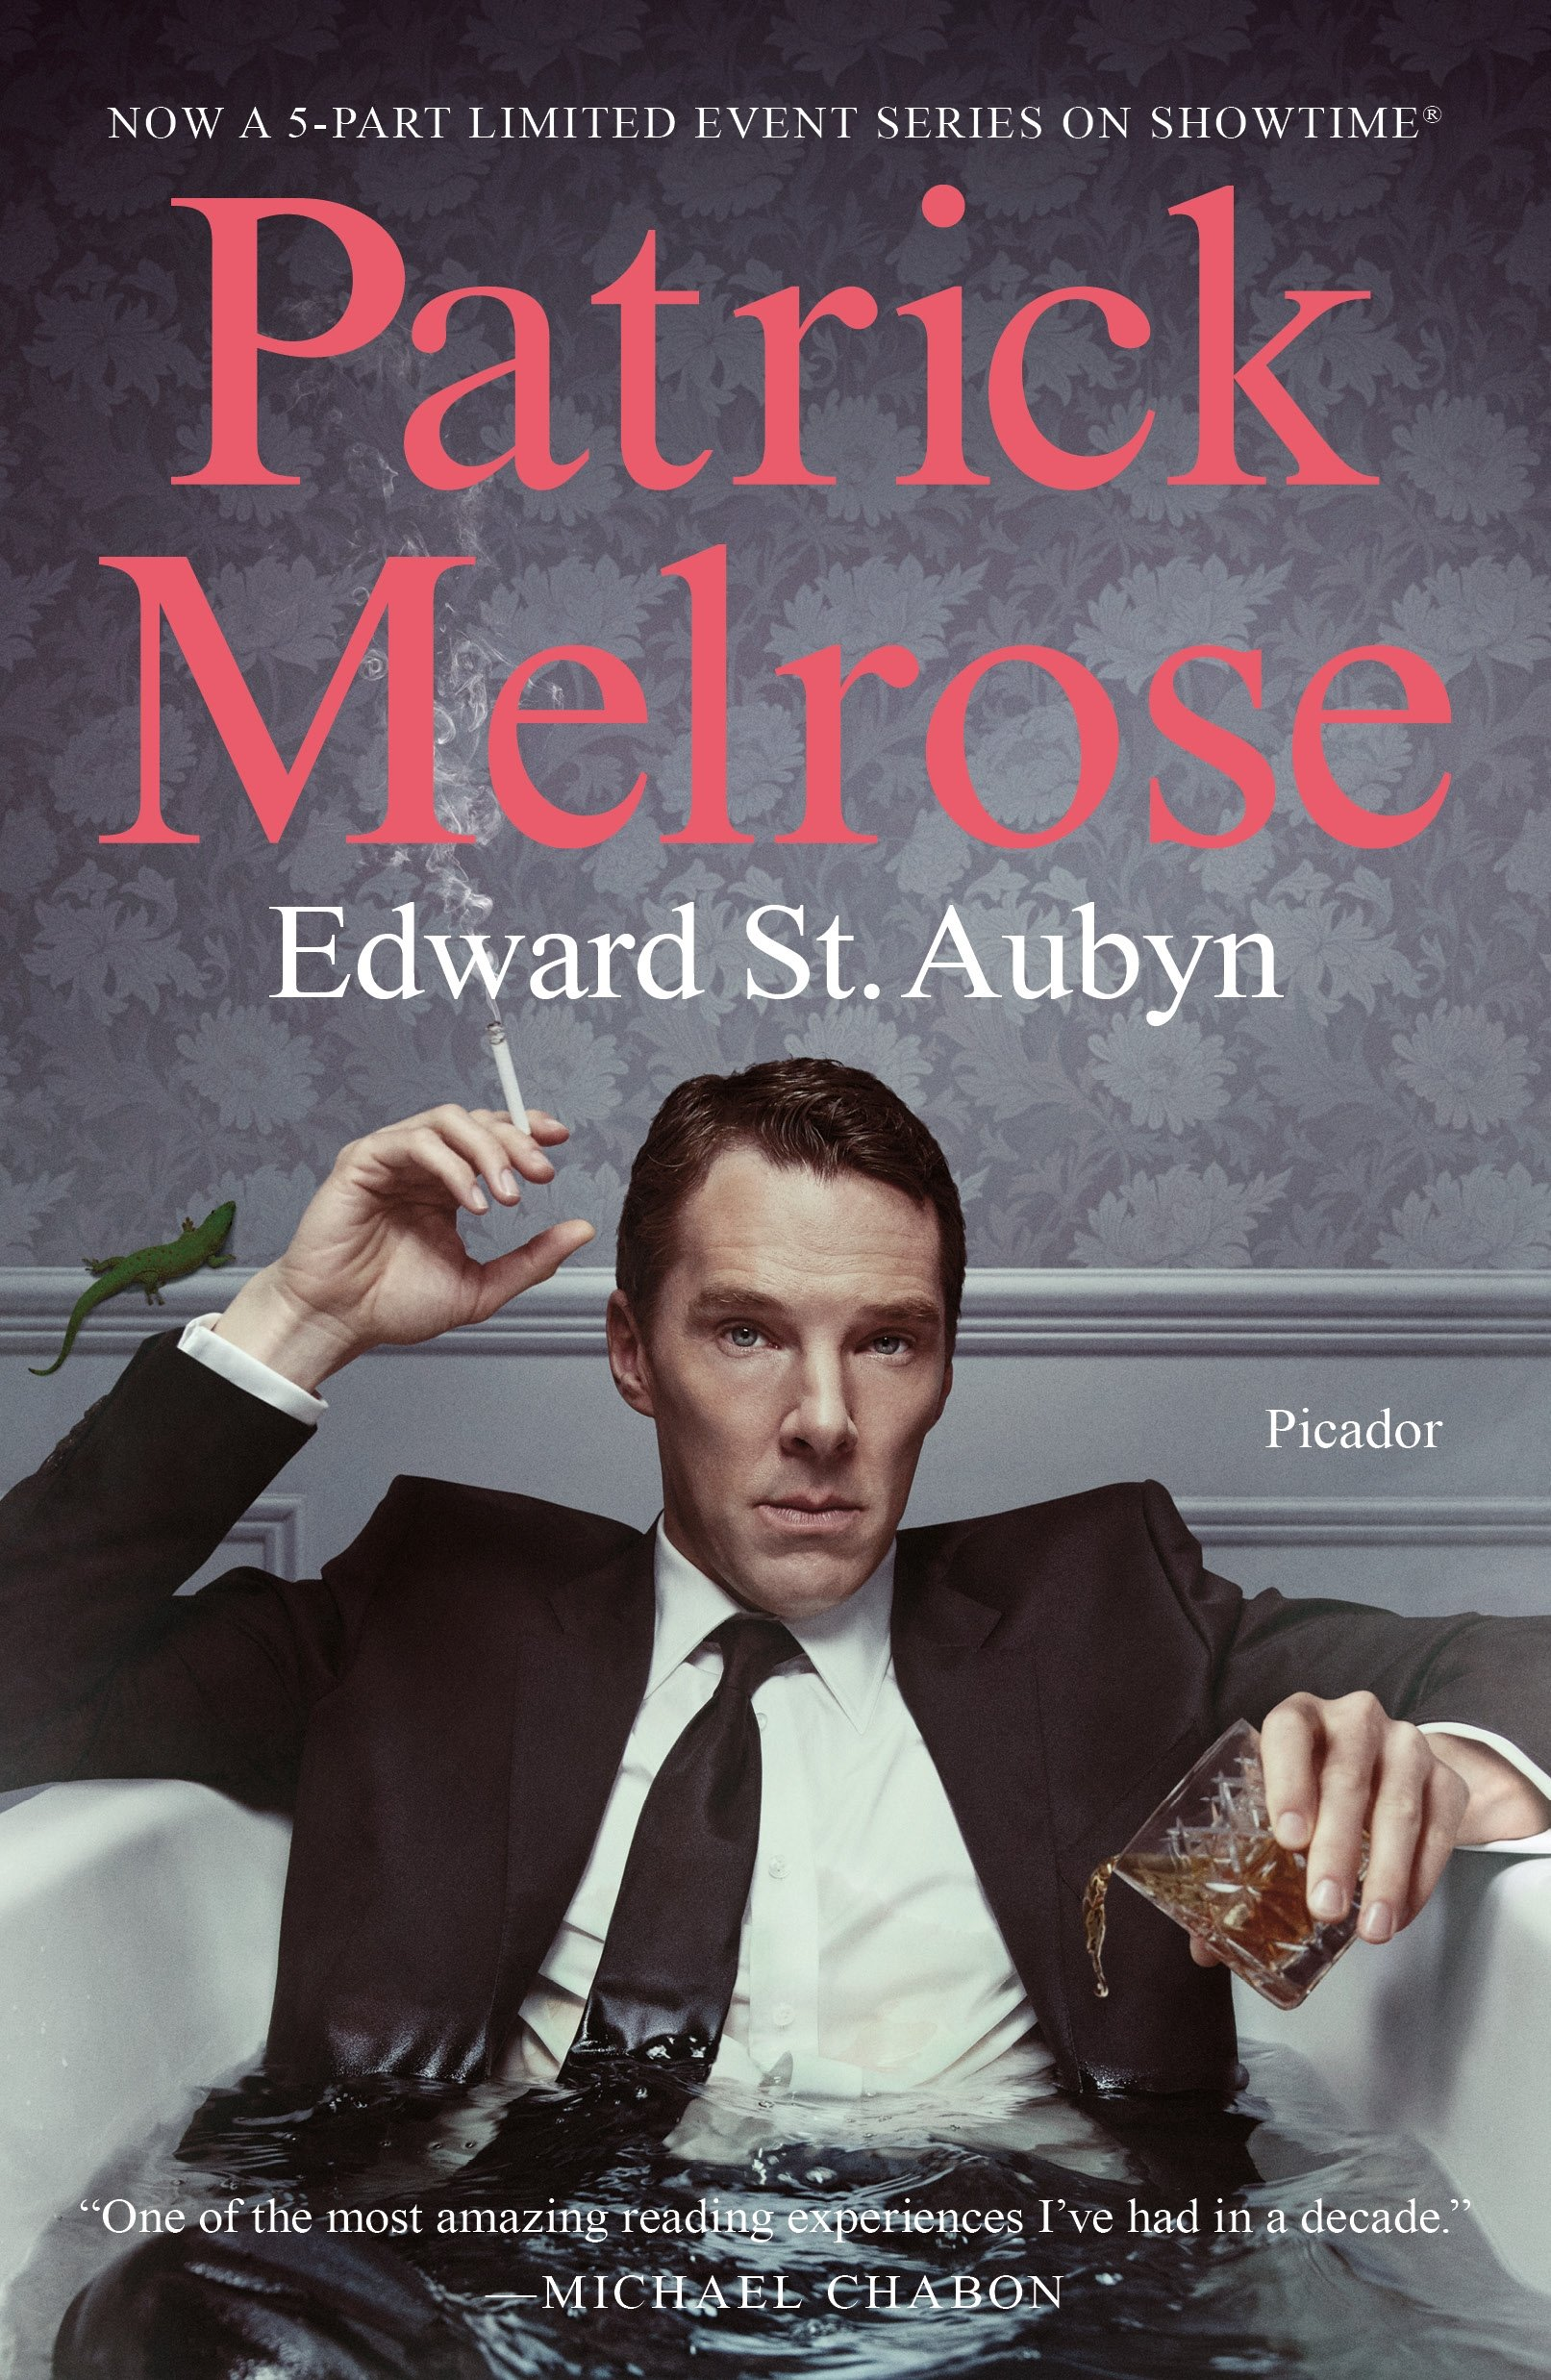 PATRICK MELROSE THE NOVELS MEDIA TIEIN International Edition: Amazon.es: EDWARD ST. AUBYN: Libros en idiomas extranjeros